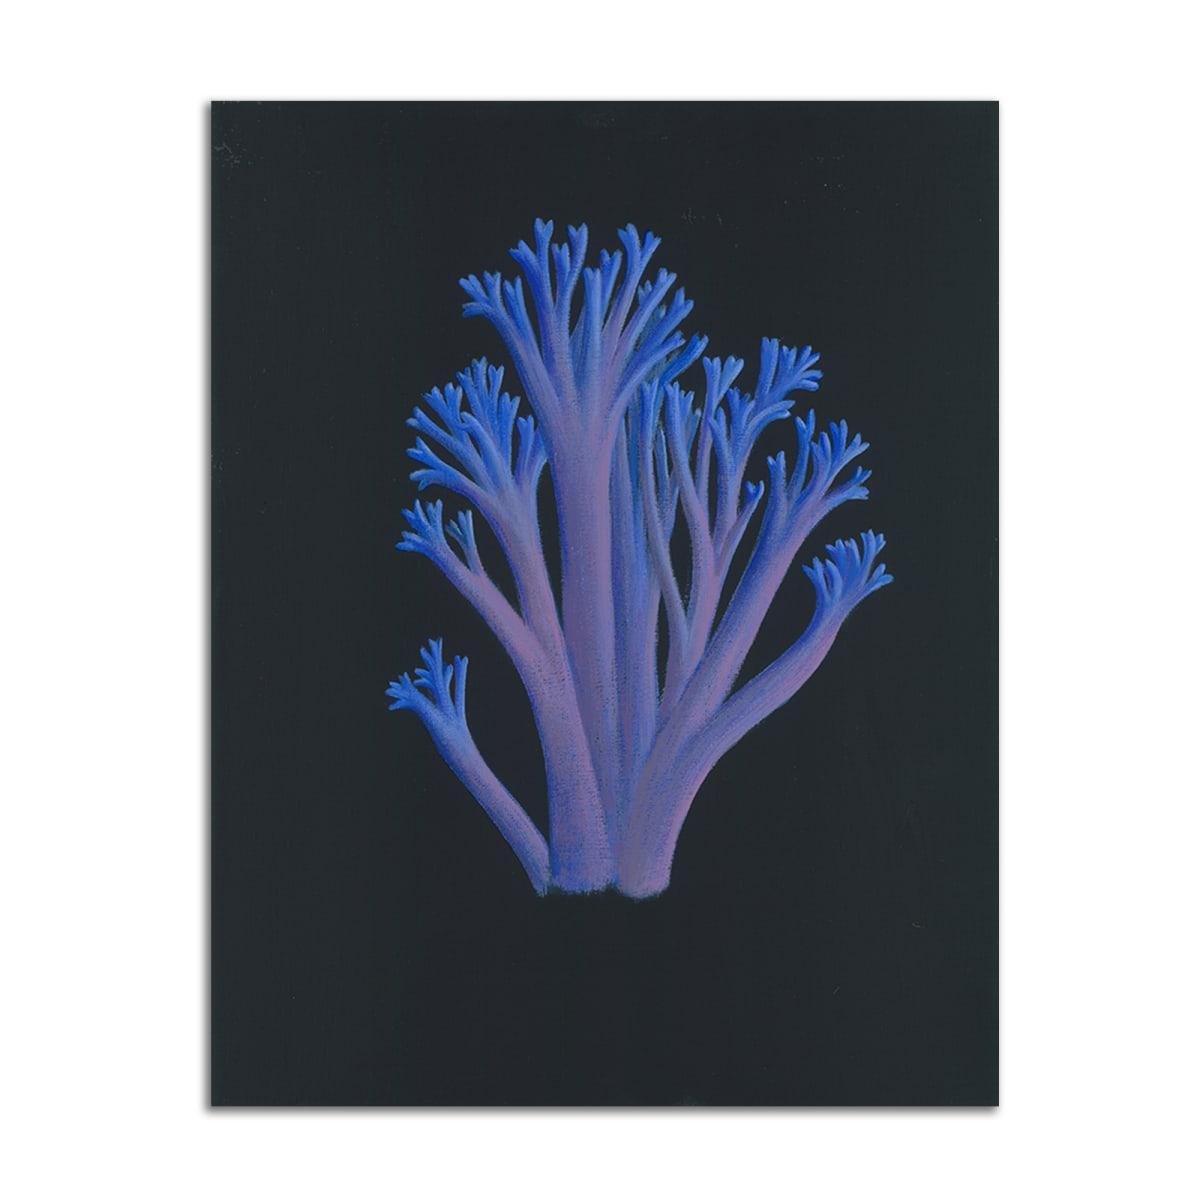 Blue Coral Mushroom by Jane Troup